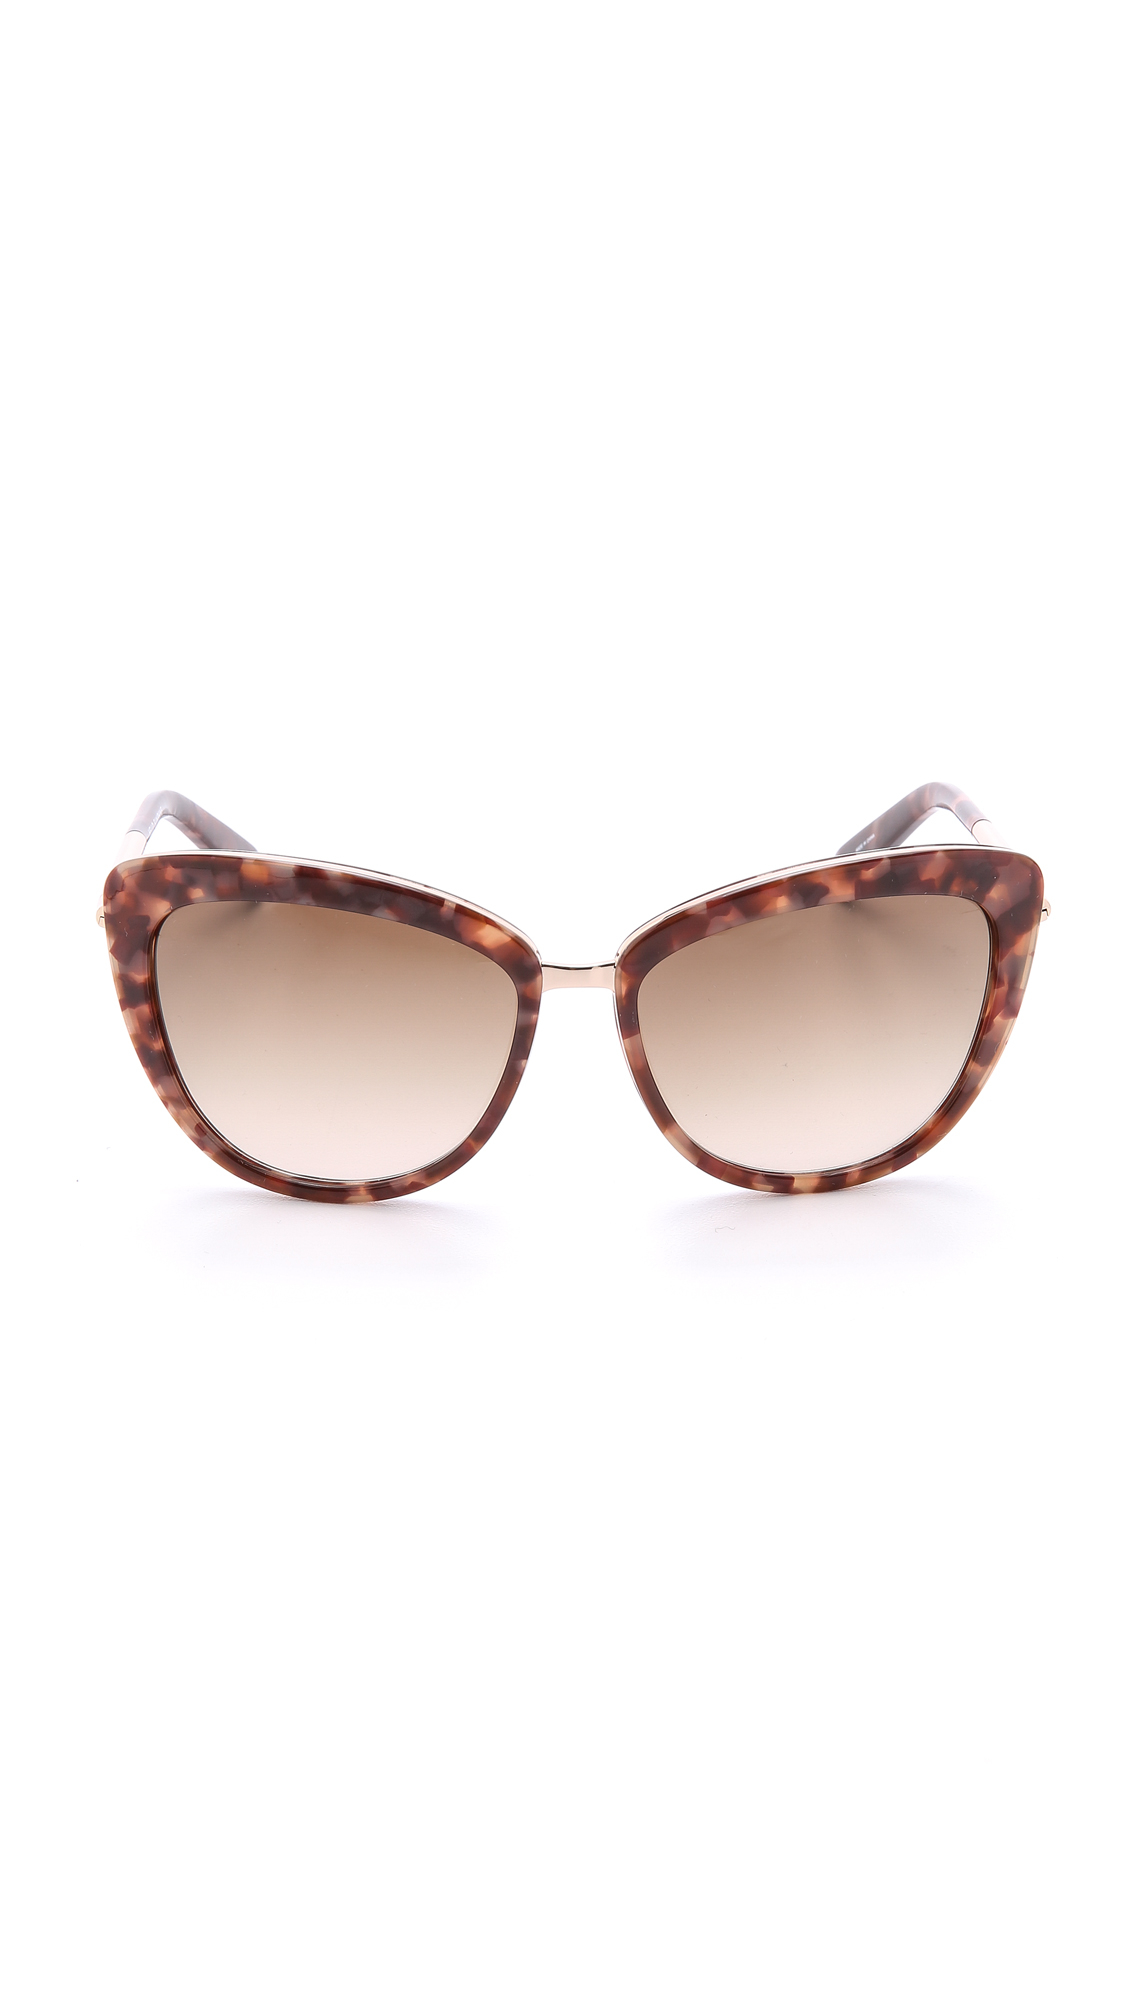 Kate Spade Kandi Sunglasses in Pink